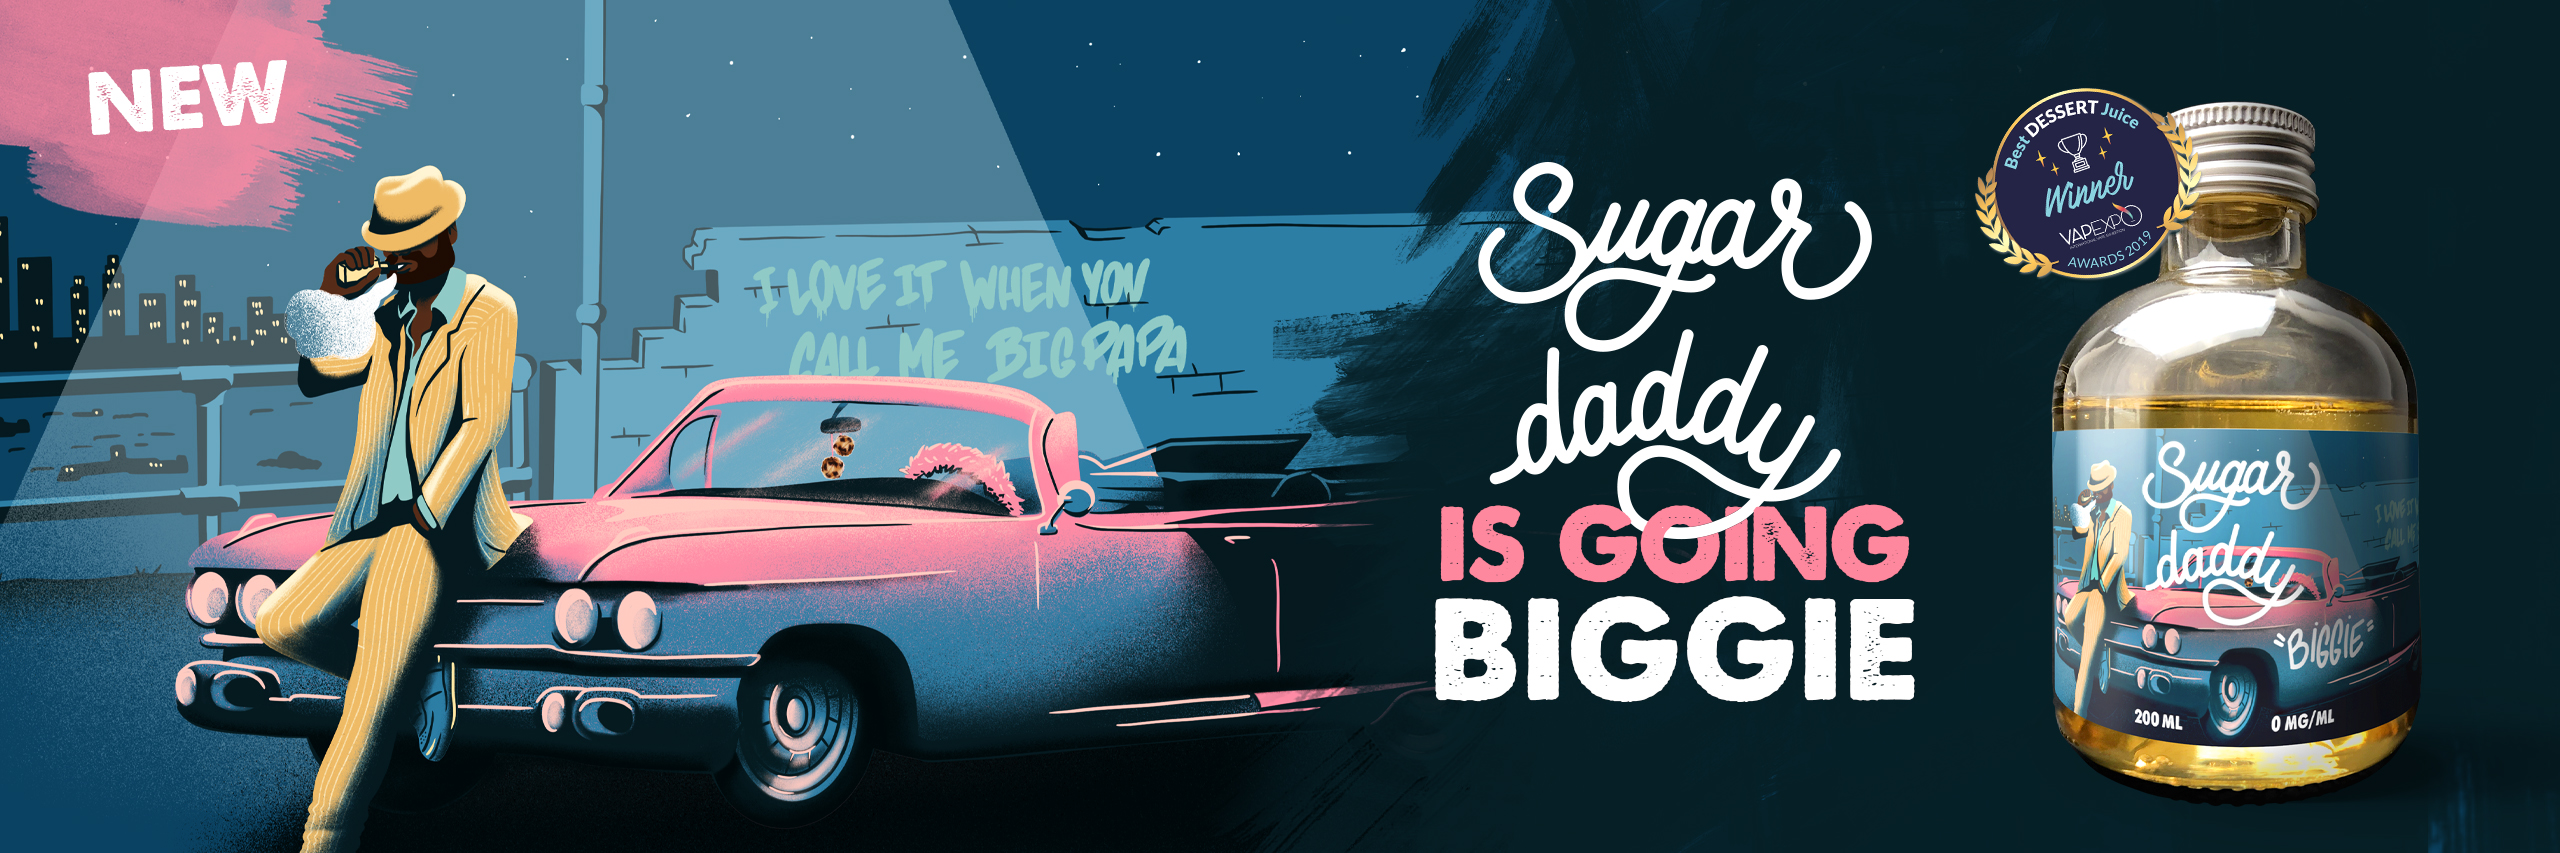 BPP-Slider-SugarDaddyBiggie